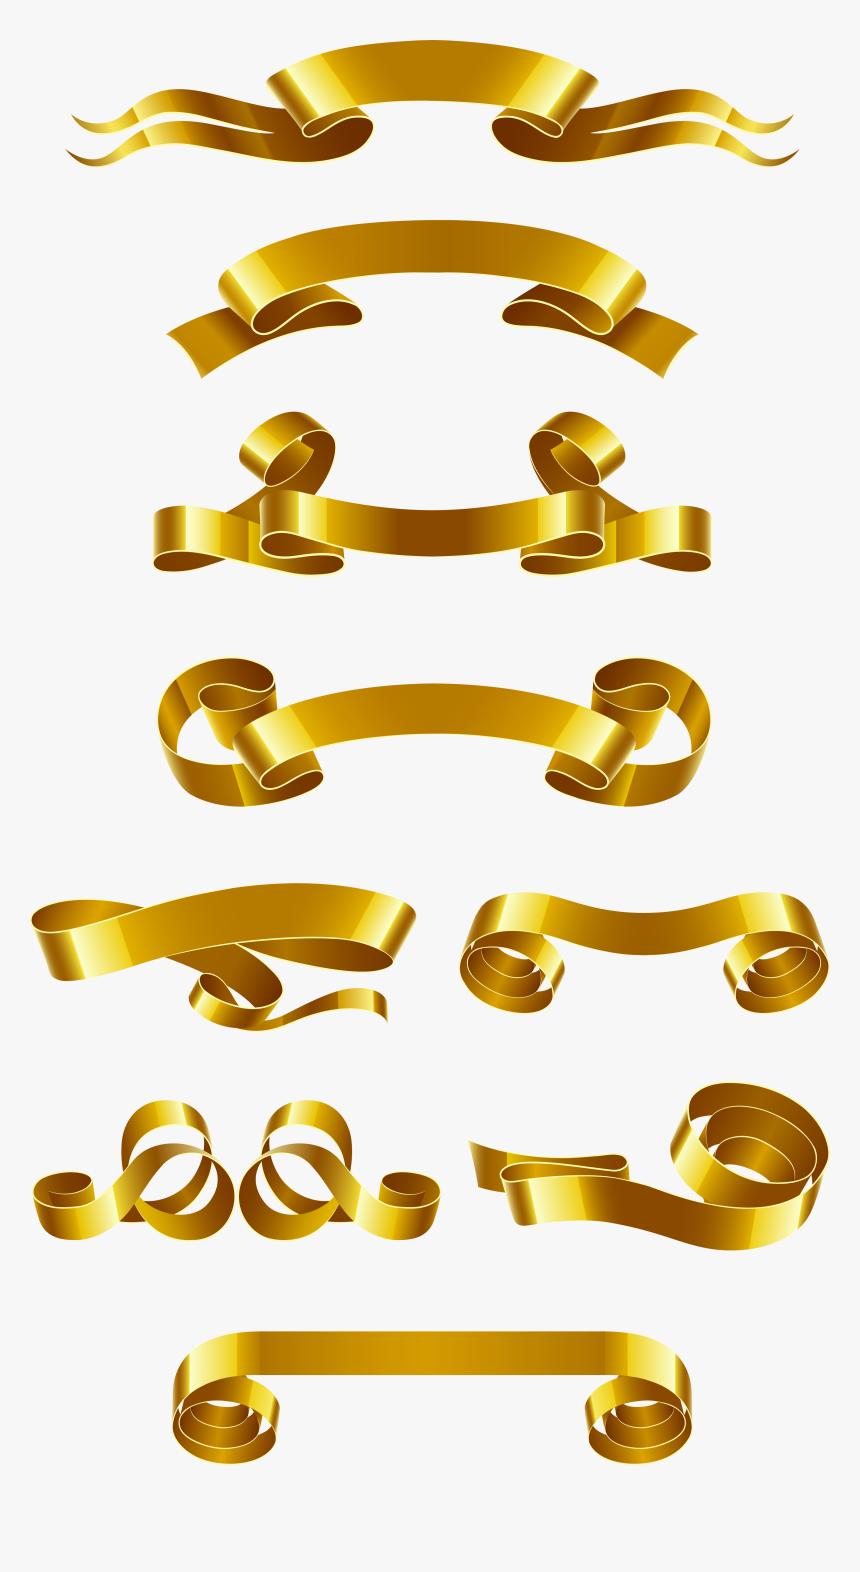 Web Gold Material Euclidean Vector Banner Ribbon Clipart - Golden Ribbon Vector Free Download, HD Png Download, Free Download